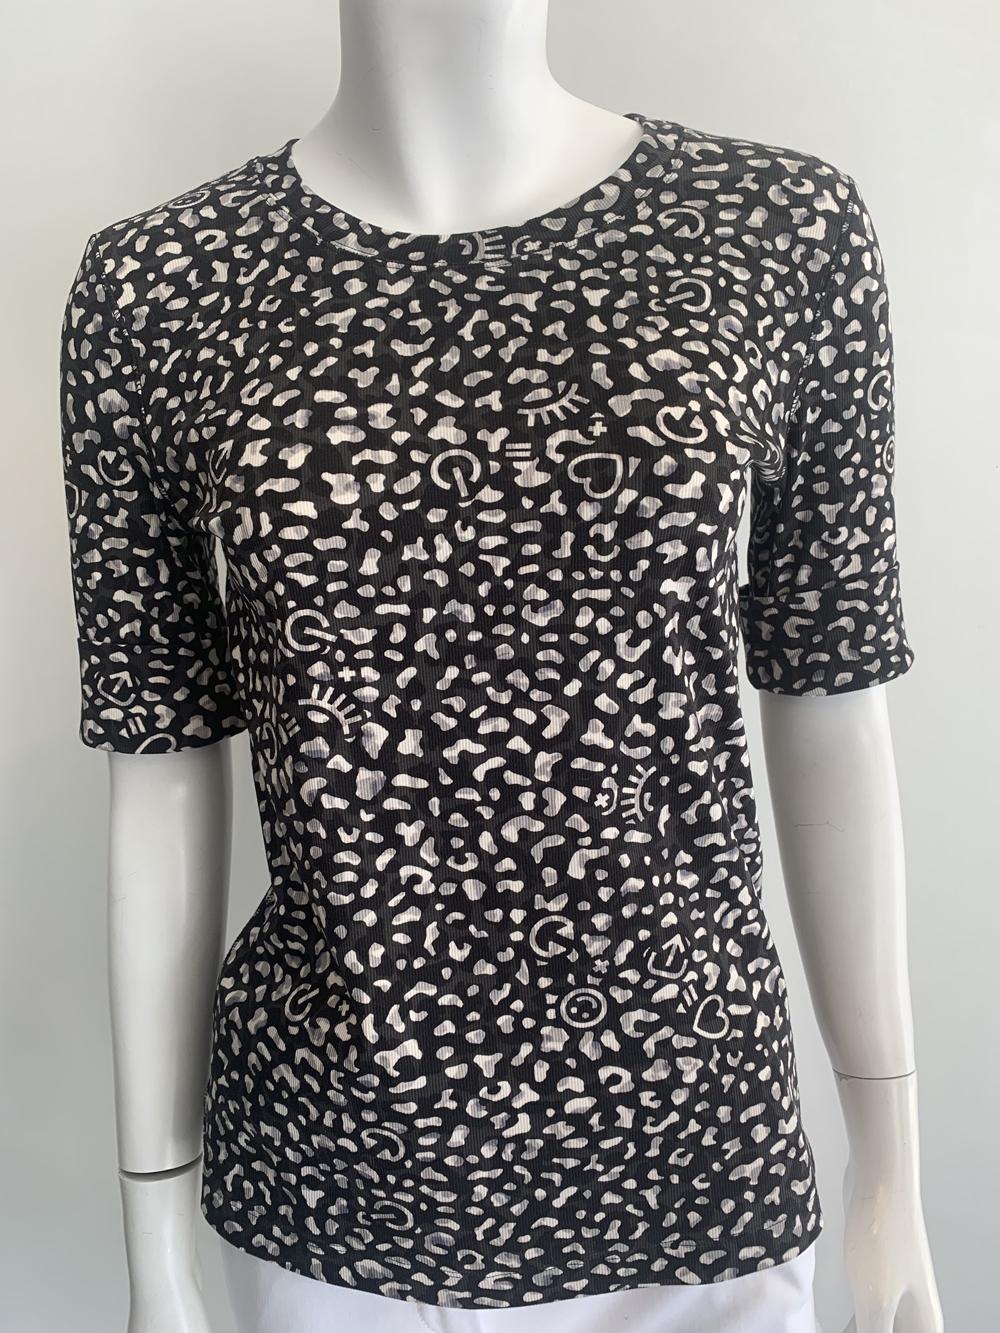 MARC CAIN Icon Leopard Print T-Shirt